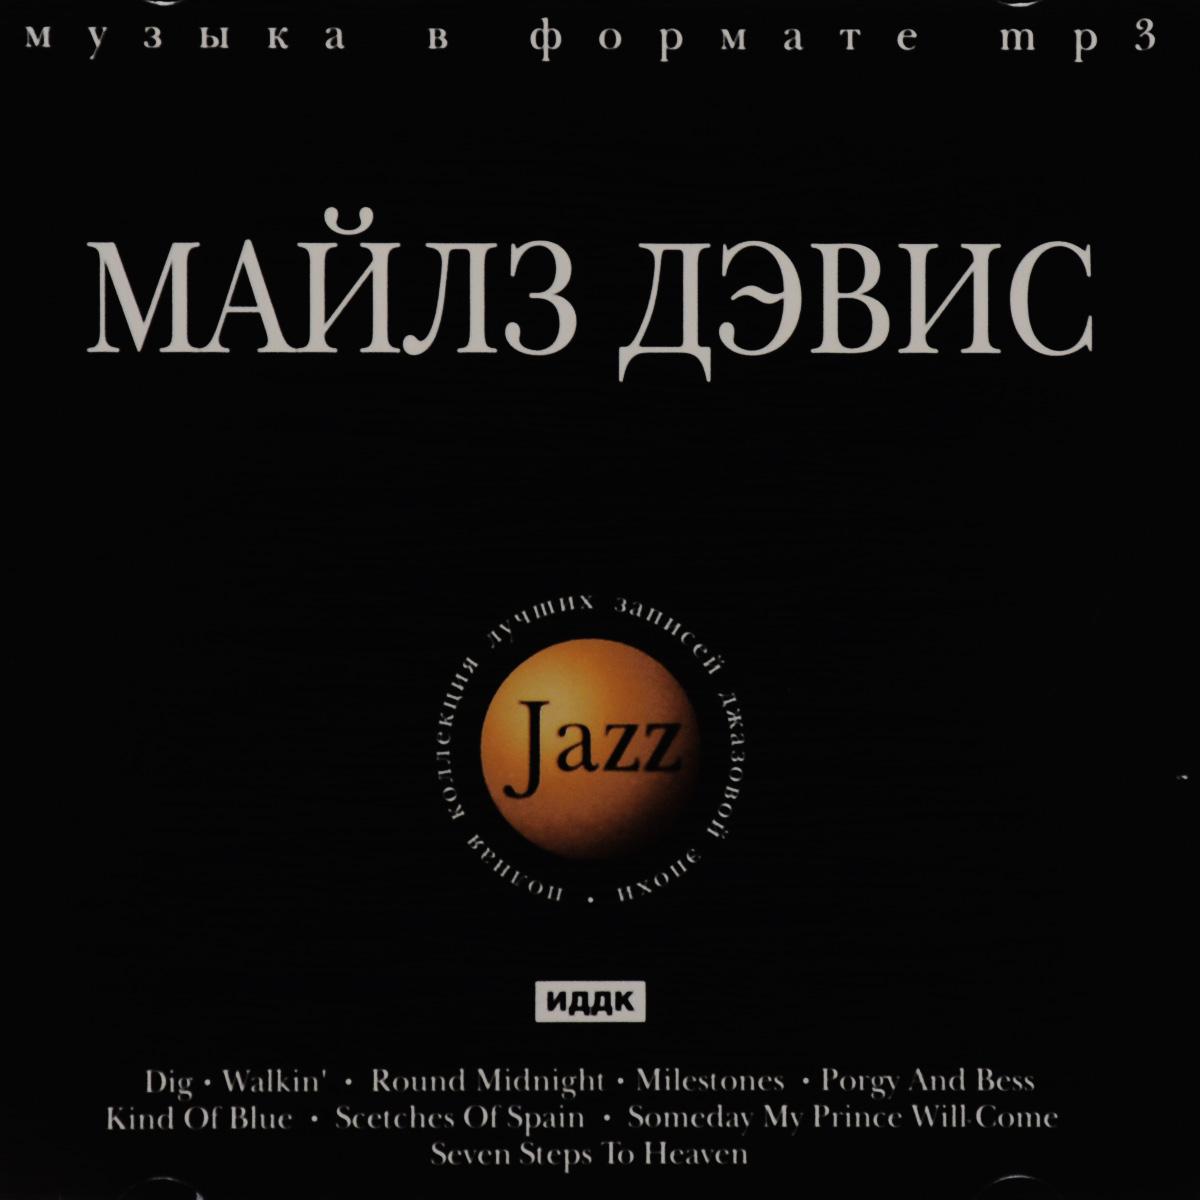 Фото - Майлз Дэвис Майлз Дэвис. Jazz (mp3) айлин майлз айлин майлз избранное избранное